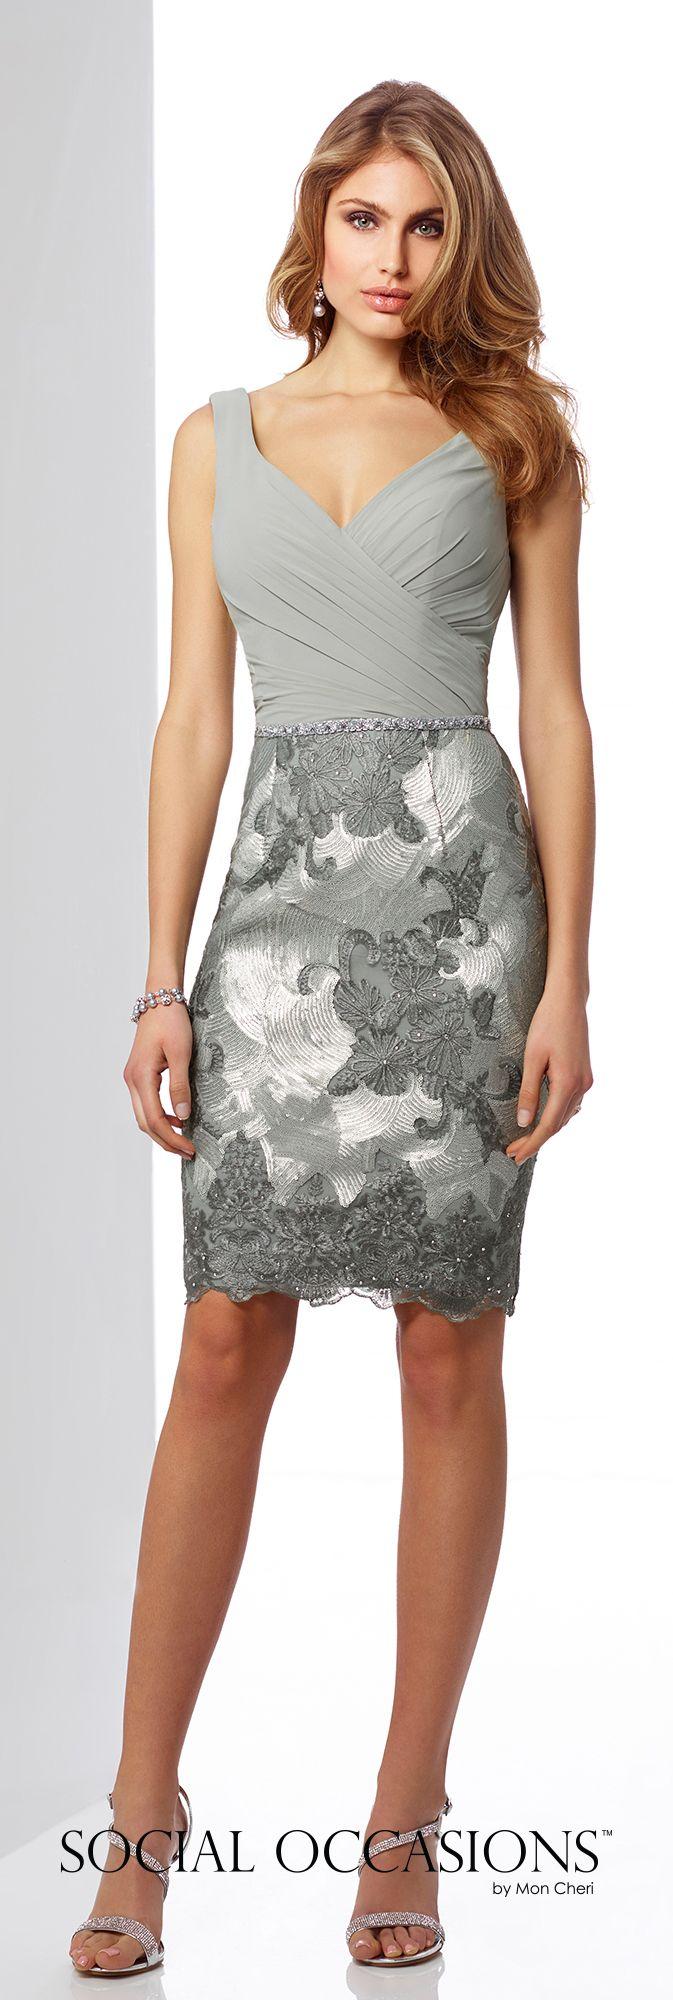 Best 25+ Short silver dress ideas on Pinterest | Silver dress ...